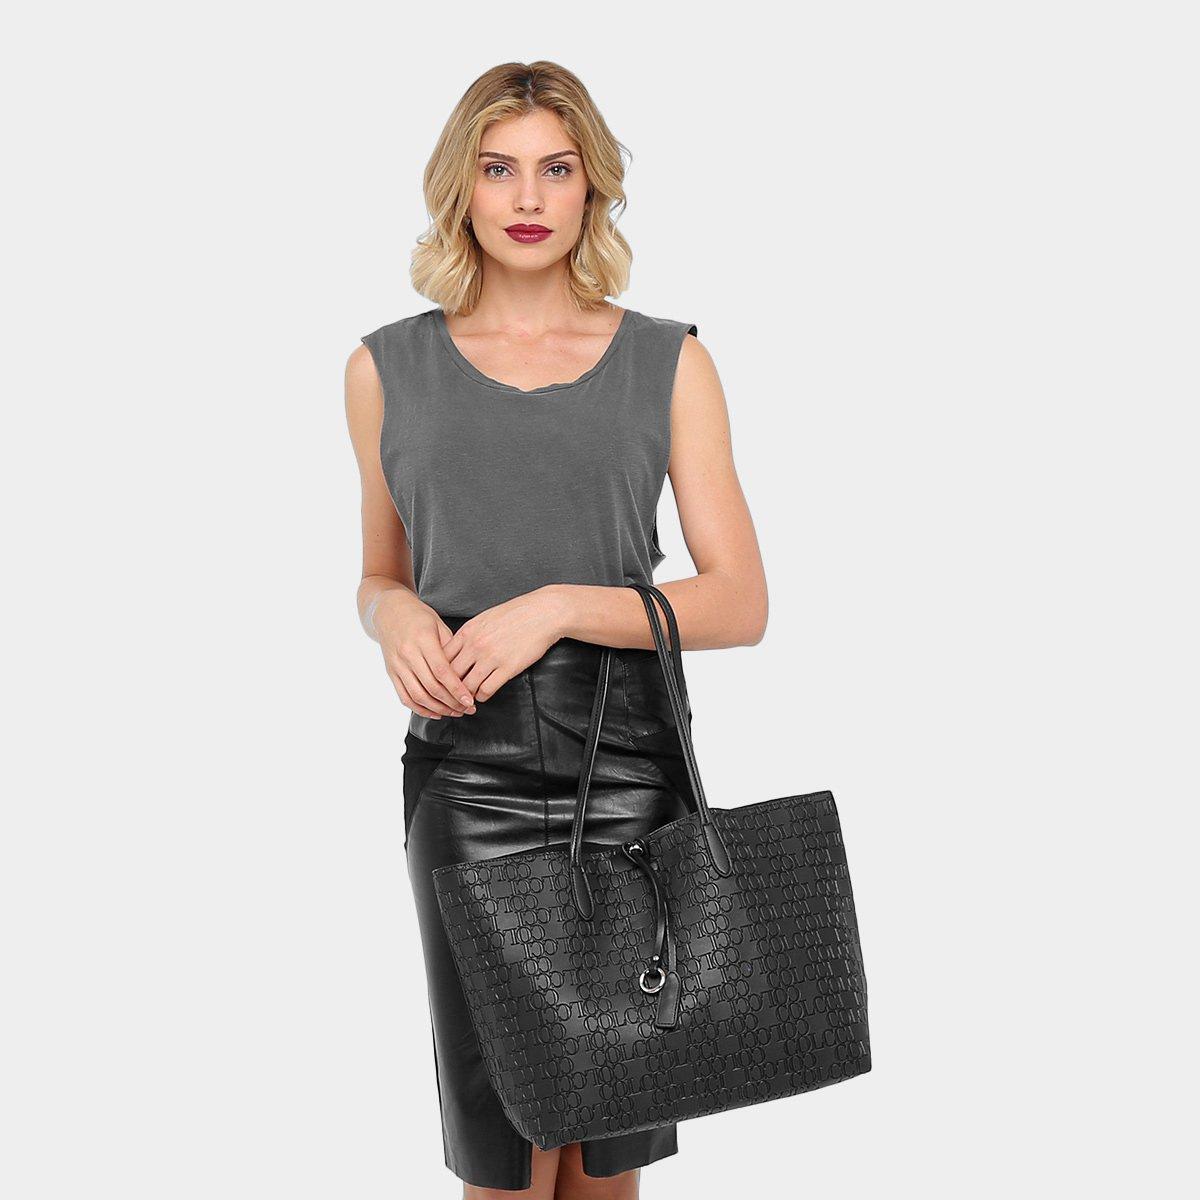 558e66633 ... Foto 2 - Bolsa Colcci Tote Shopper Feminina